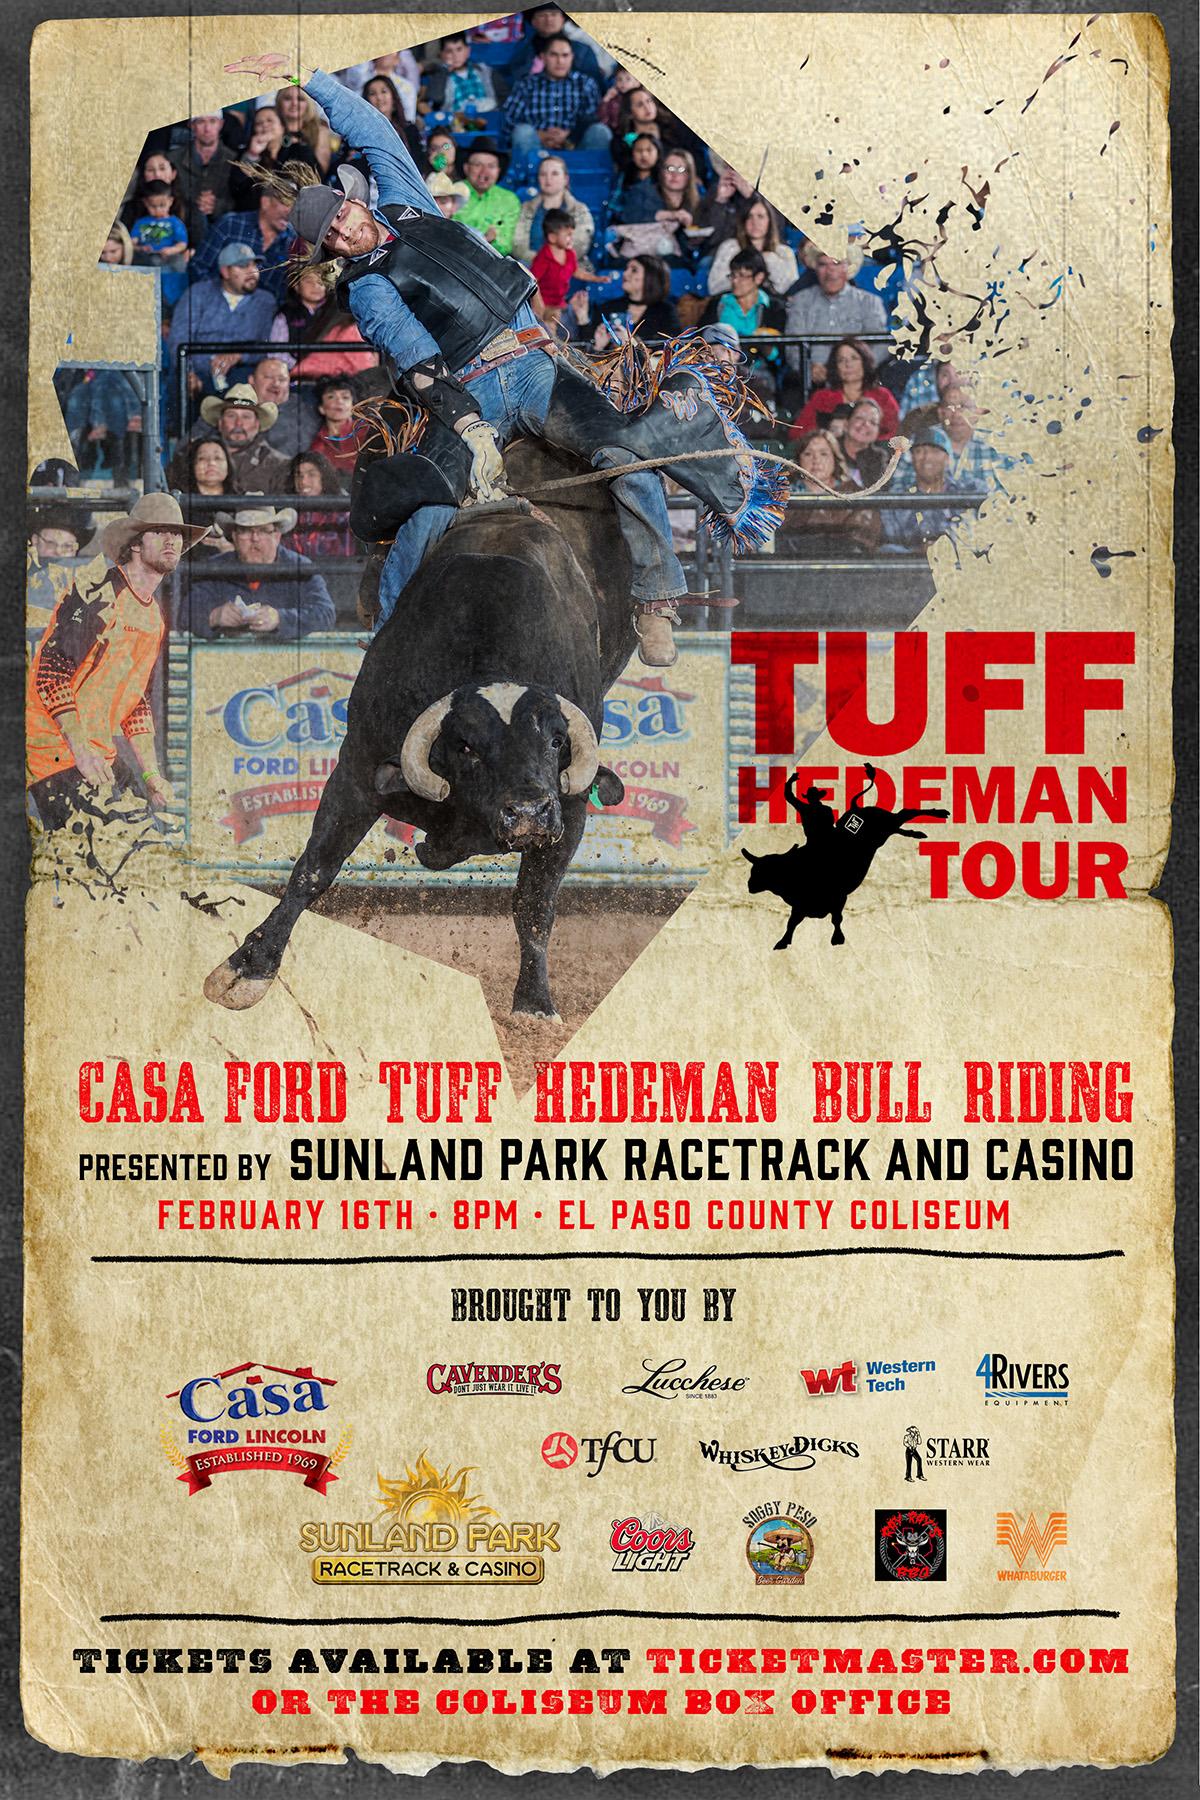 Casa Ford El Paso Tx >> Tuff Hedeman Bull Riding Tour El Paso Tx Tuff Hedeman